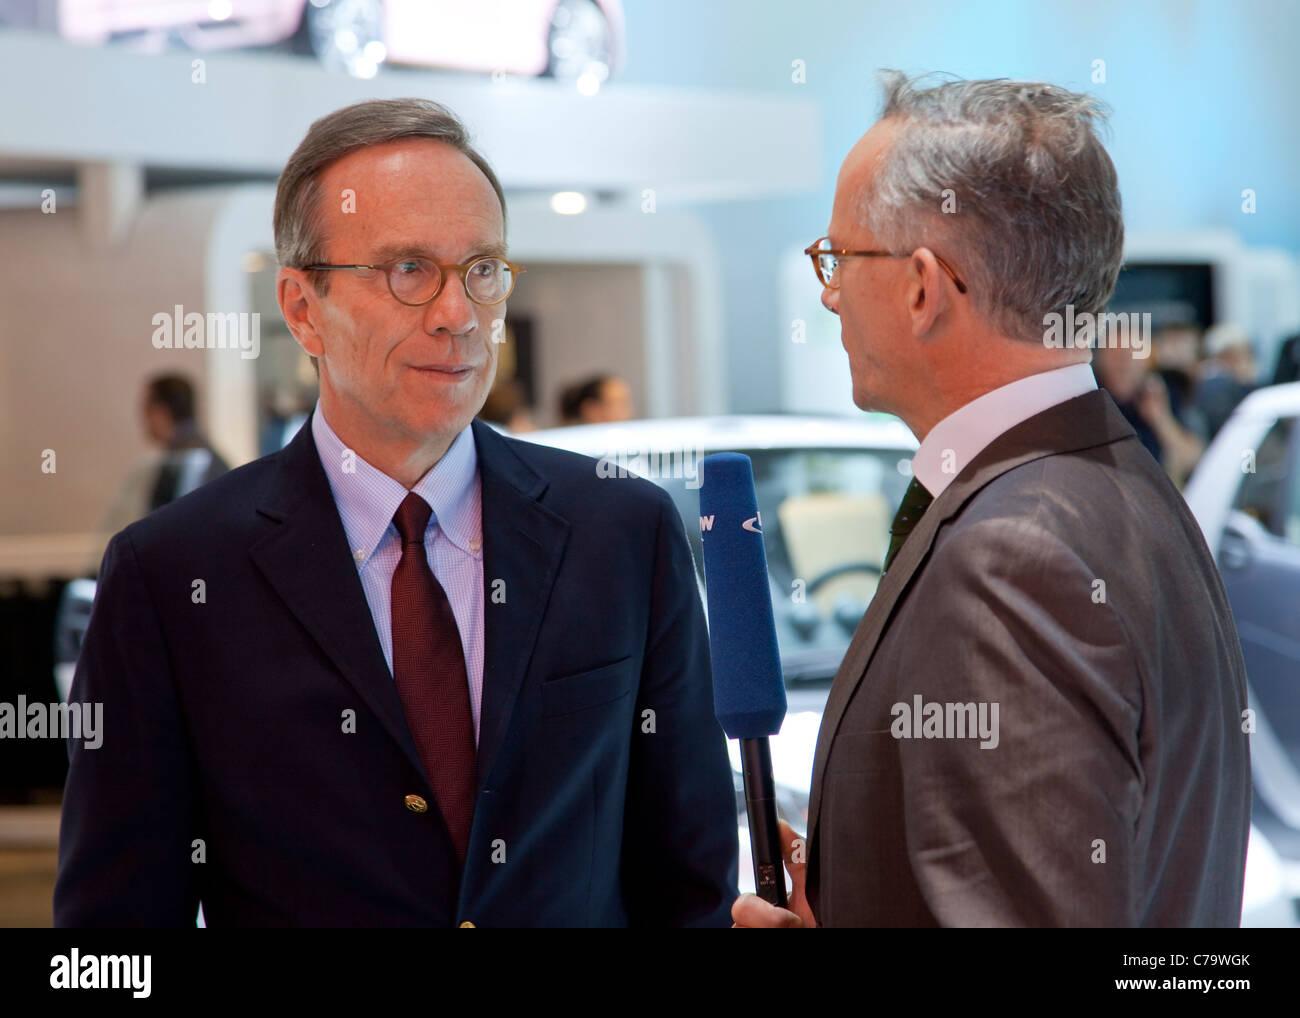 VDA Boss Matthias Wissmann on the IAA 2011 International Motor Show in Frankfurt am Main, Germany - Stock Image